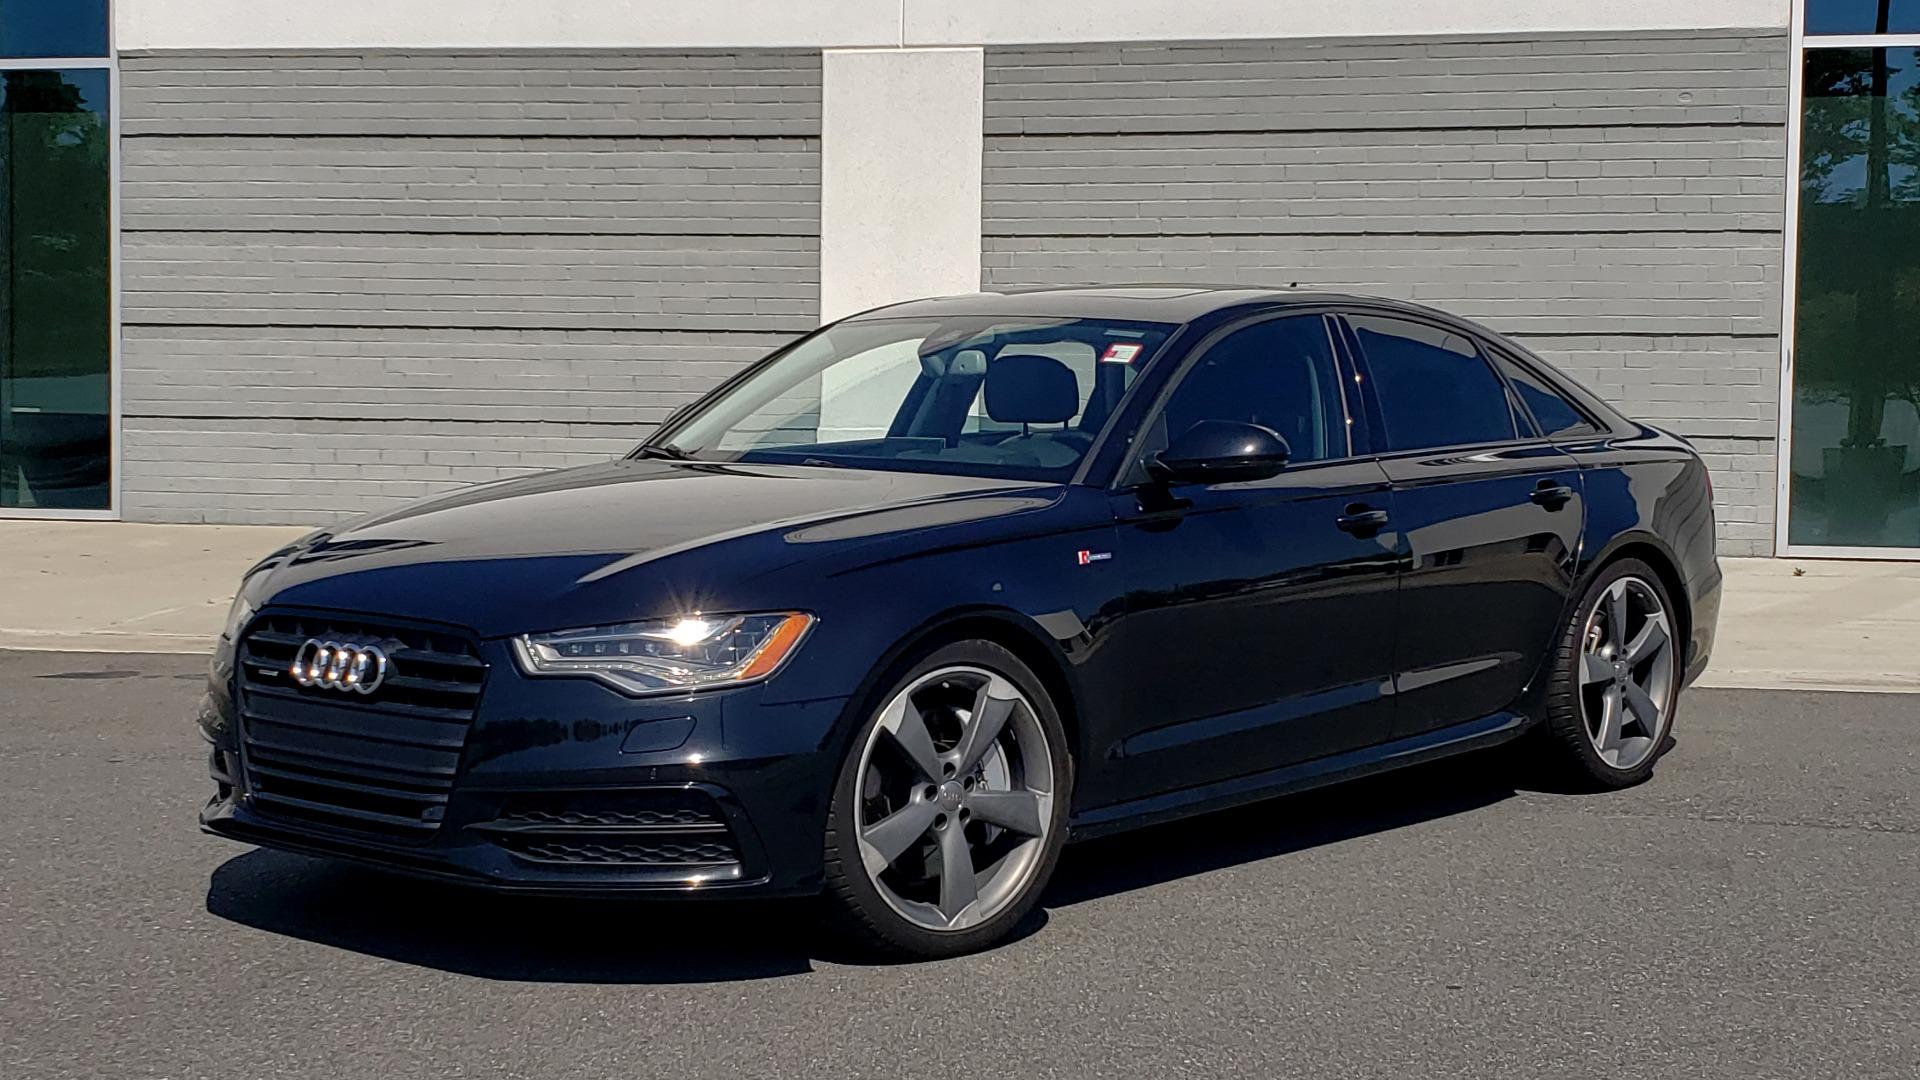 Used 2015 Audi A6 3.0T PRESTIGE / BLACK OPTIC / CLD WTHR / BOSE / HUD / SUNROOF for sale $21,995 at Formula Imports in Charlotte NC 28227 1